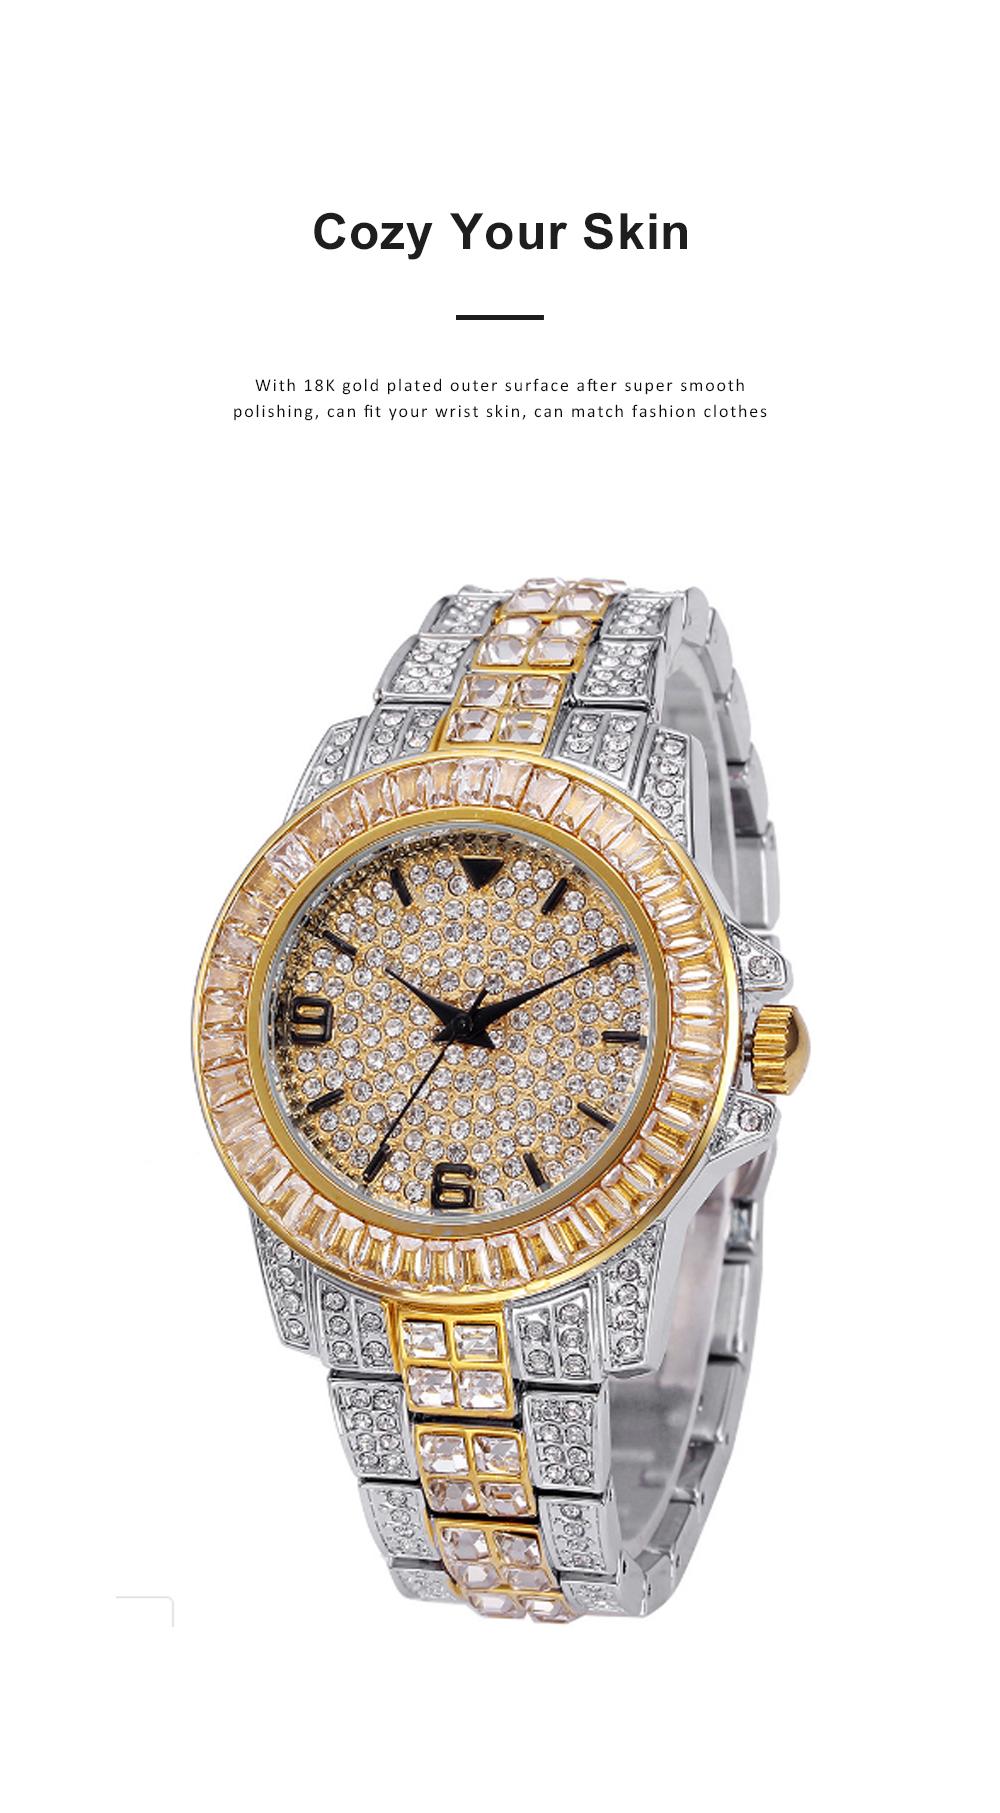 New Men Fashion Exquisite Waterproof Diamond Date Quartz Watch Gold Stainless Steel Business Luxury Mens Watches 3